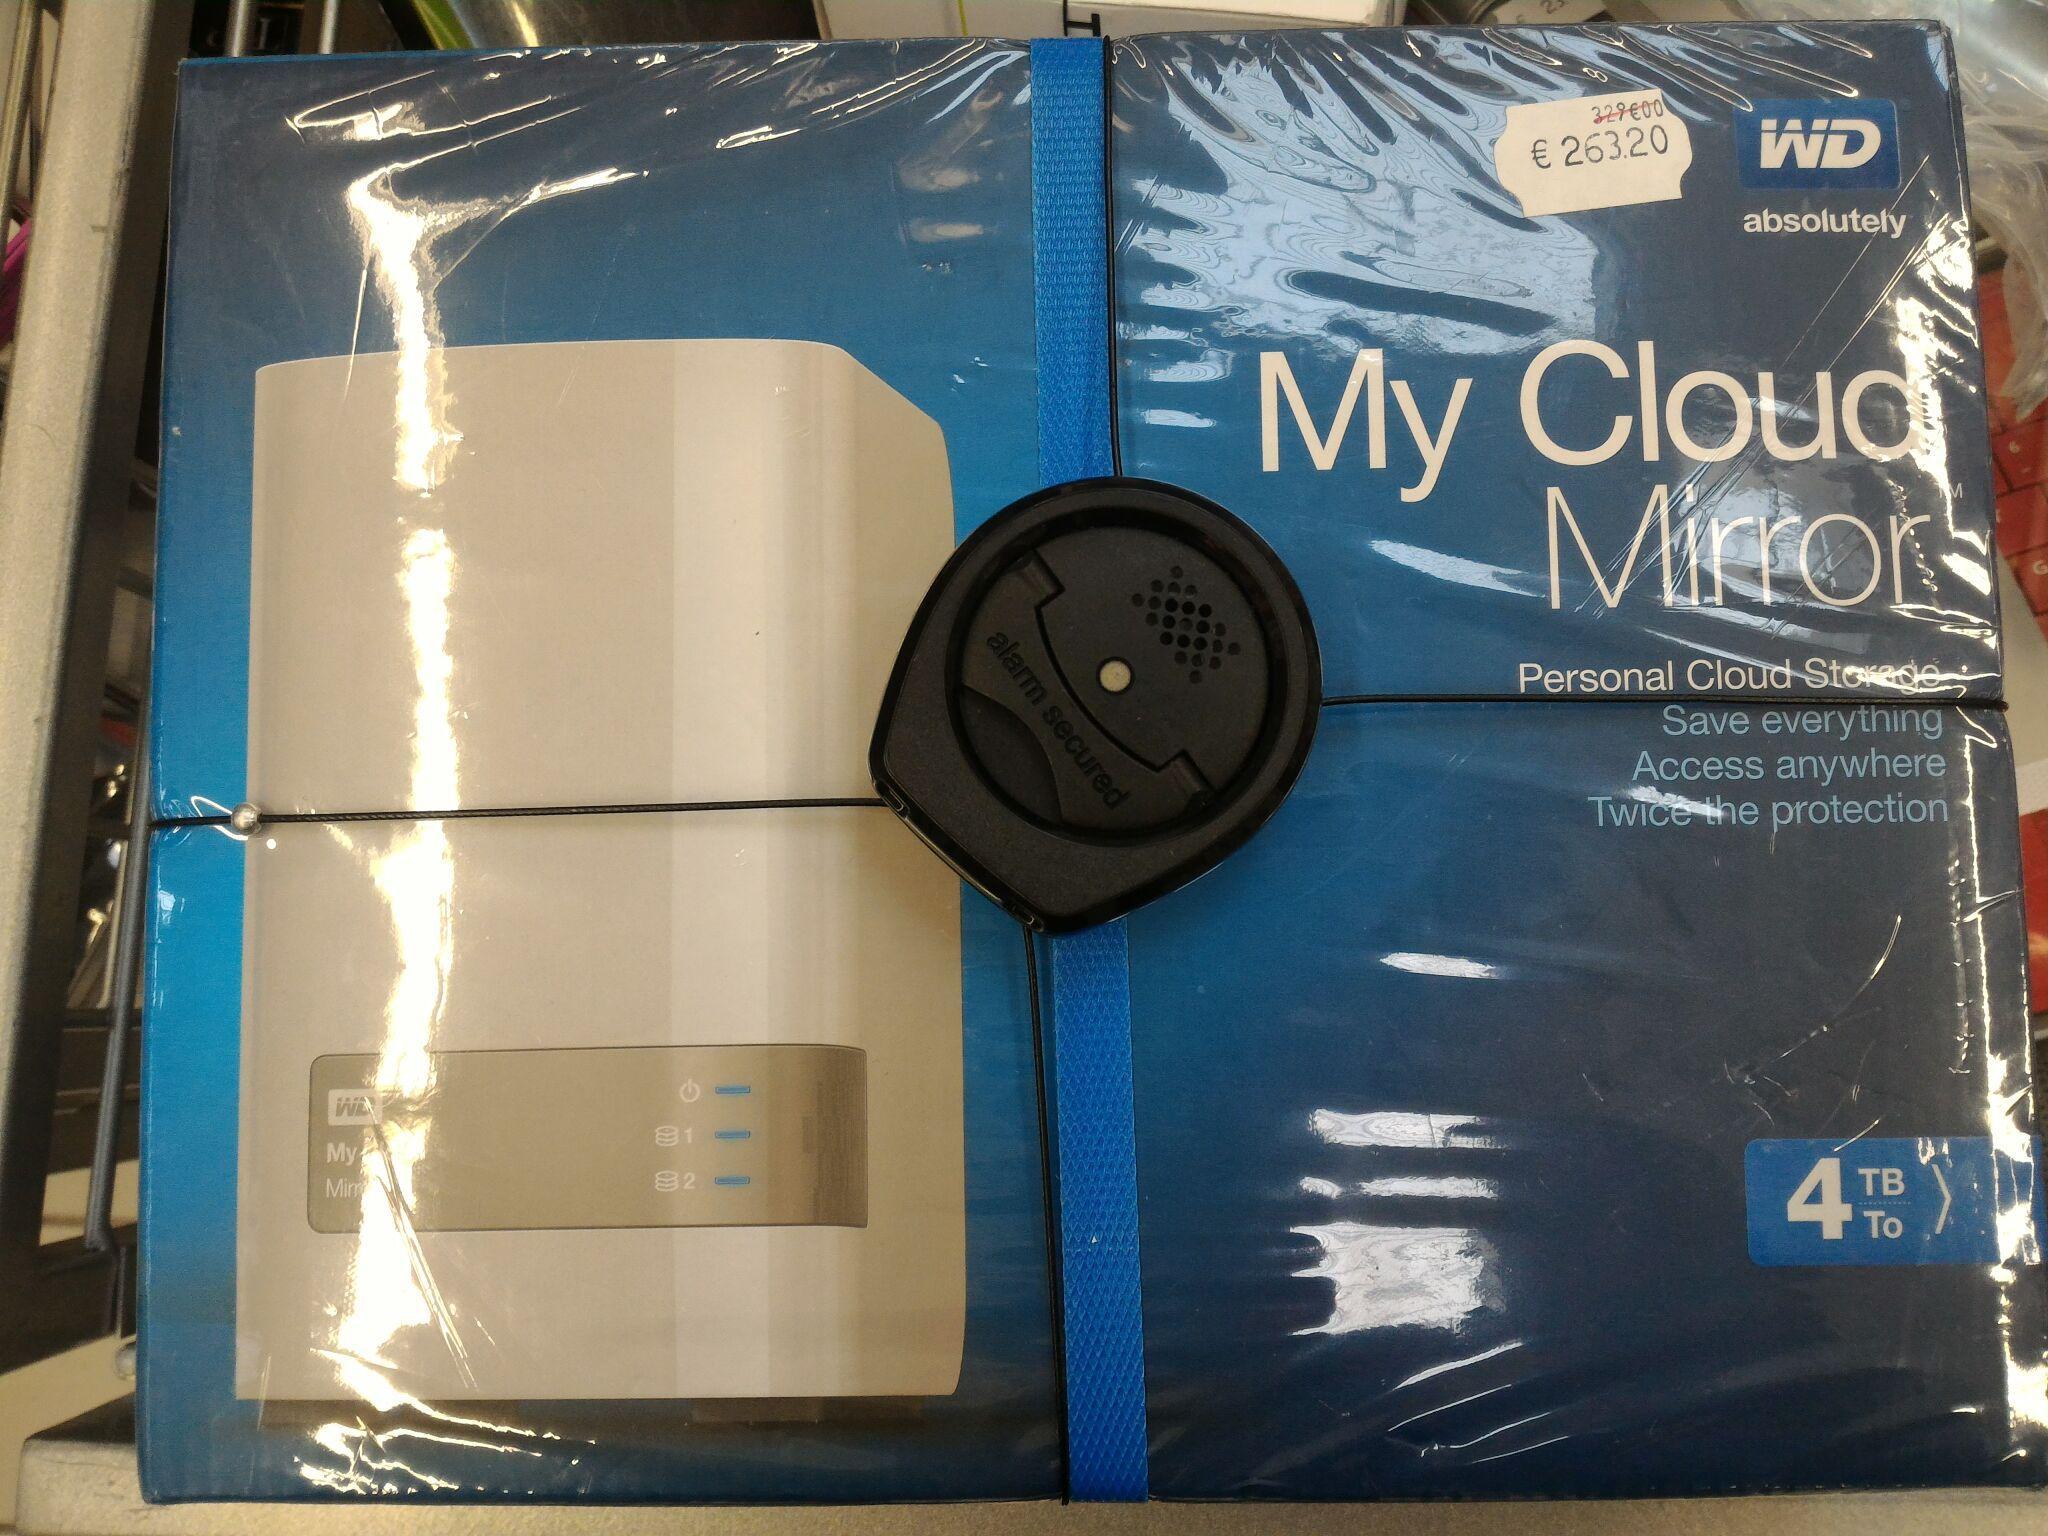 Western Digital My Cloud Mirror (Gen 2) 4 To